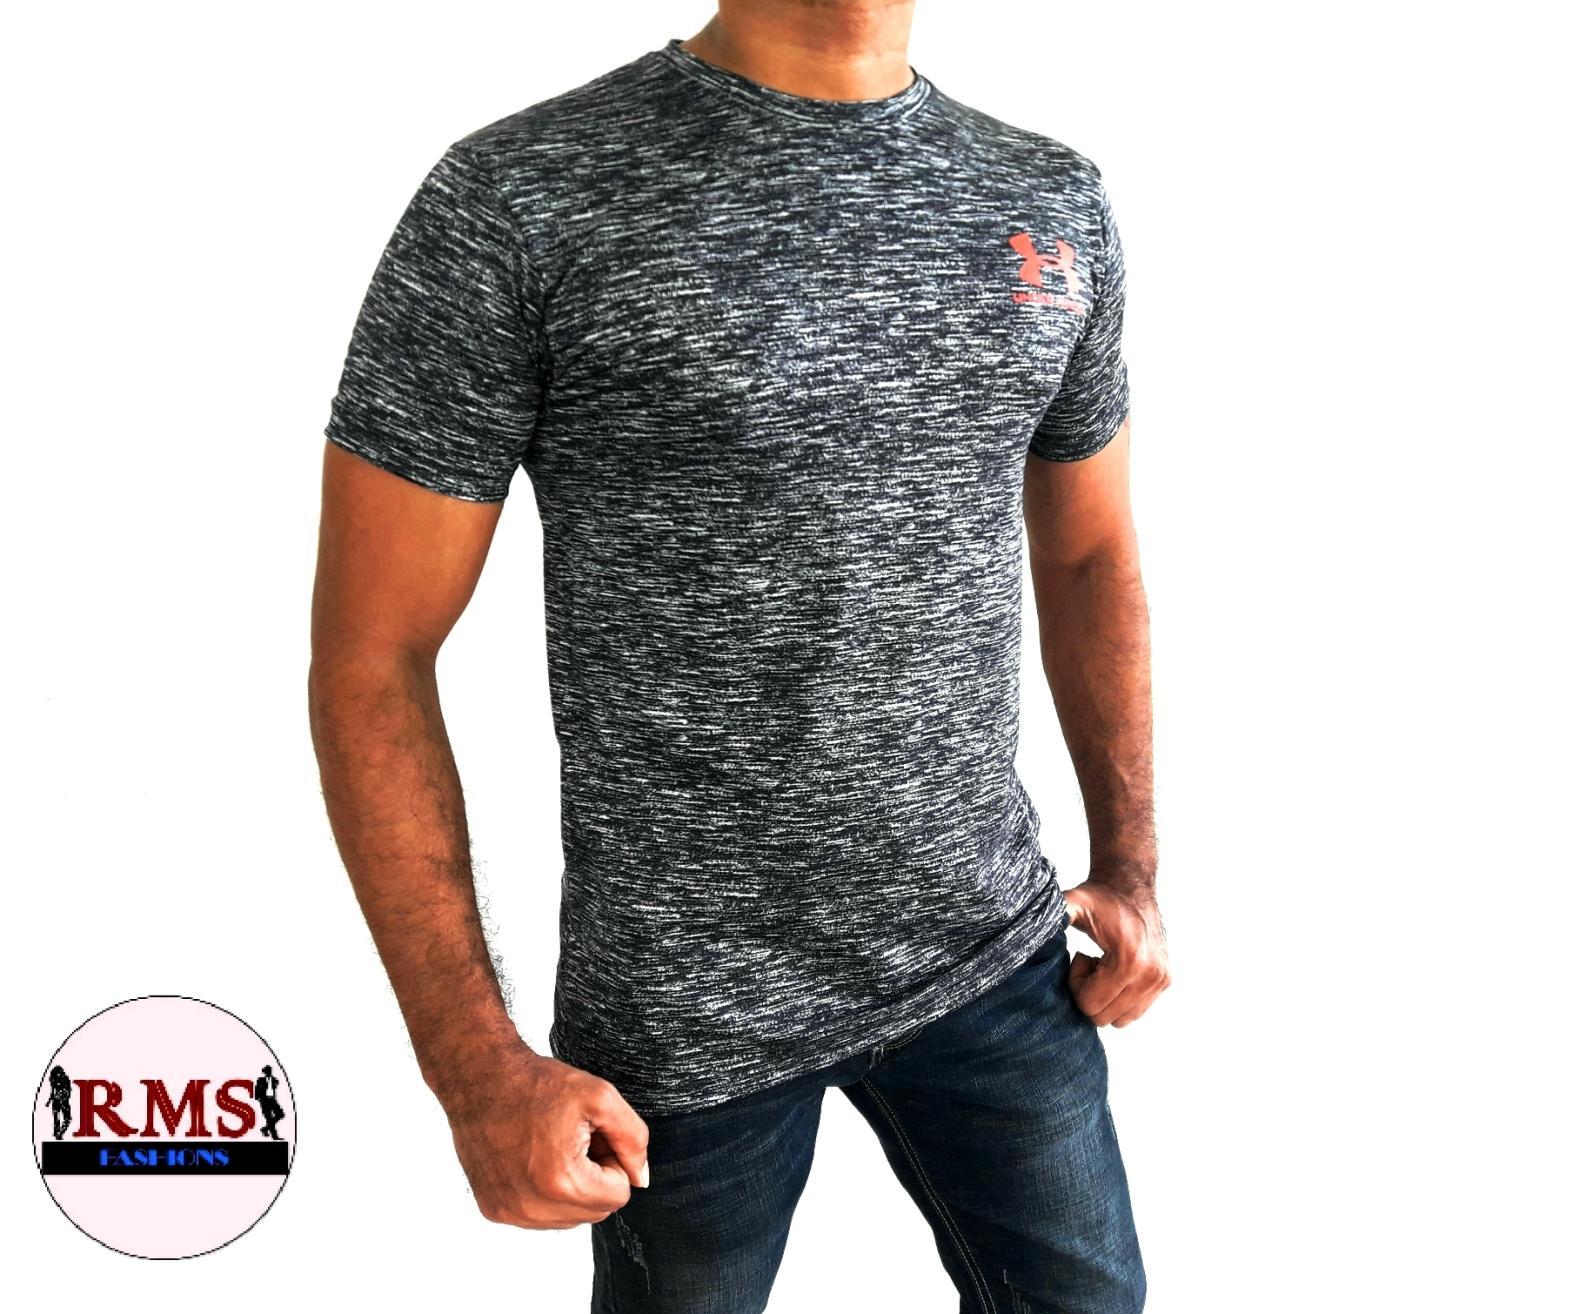 Men's UA Dry-Fit T-shirt - Black